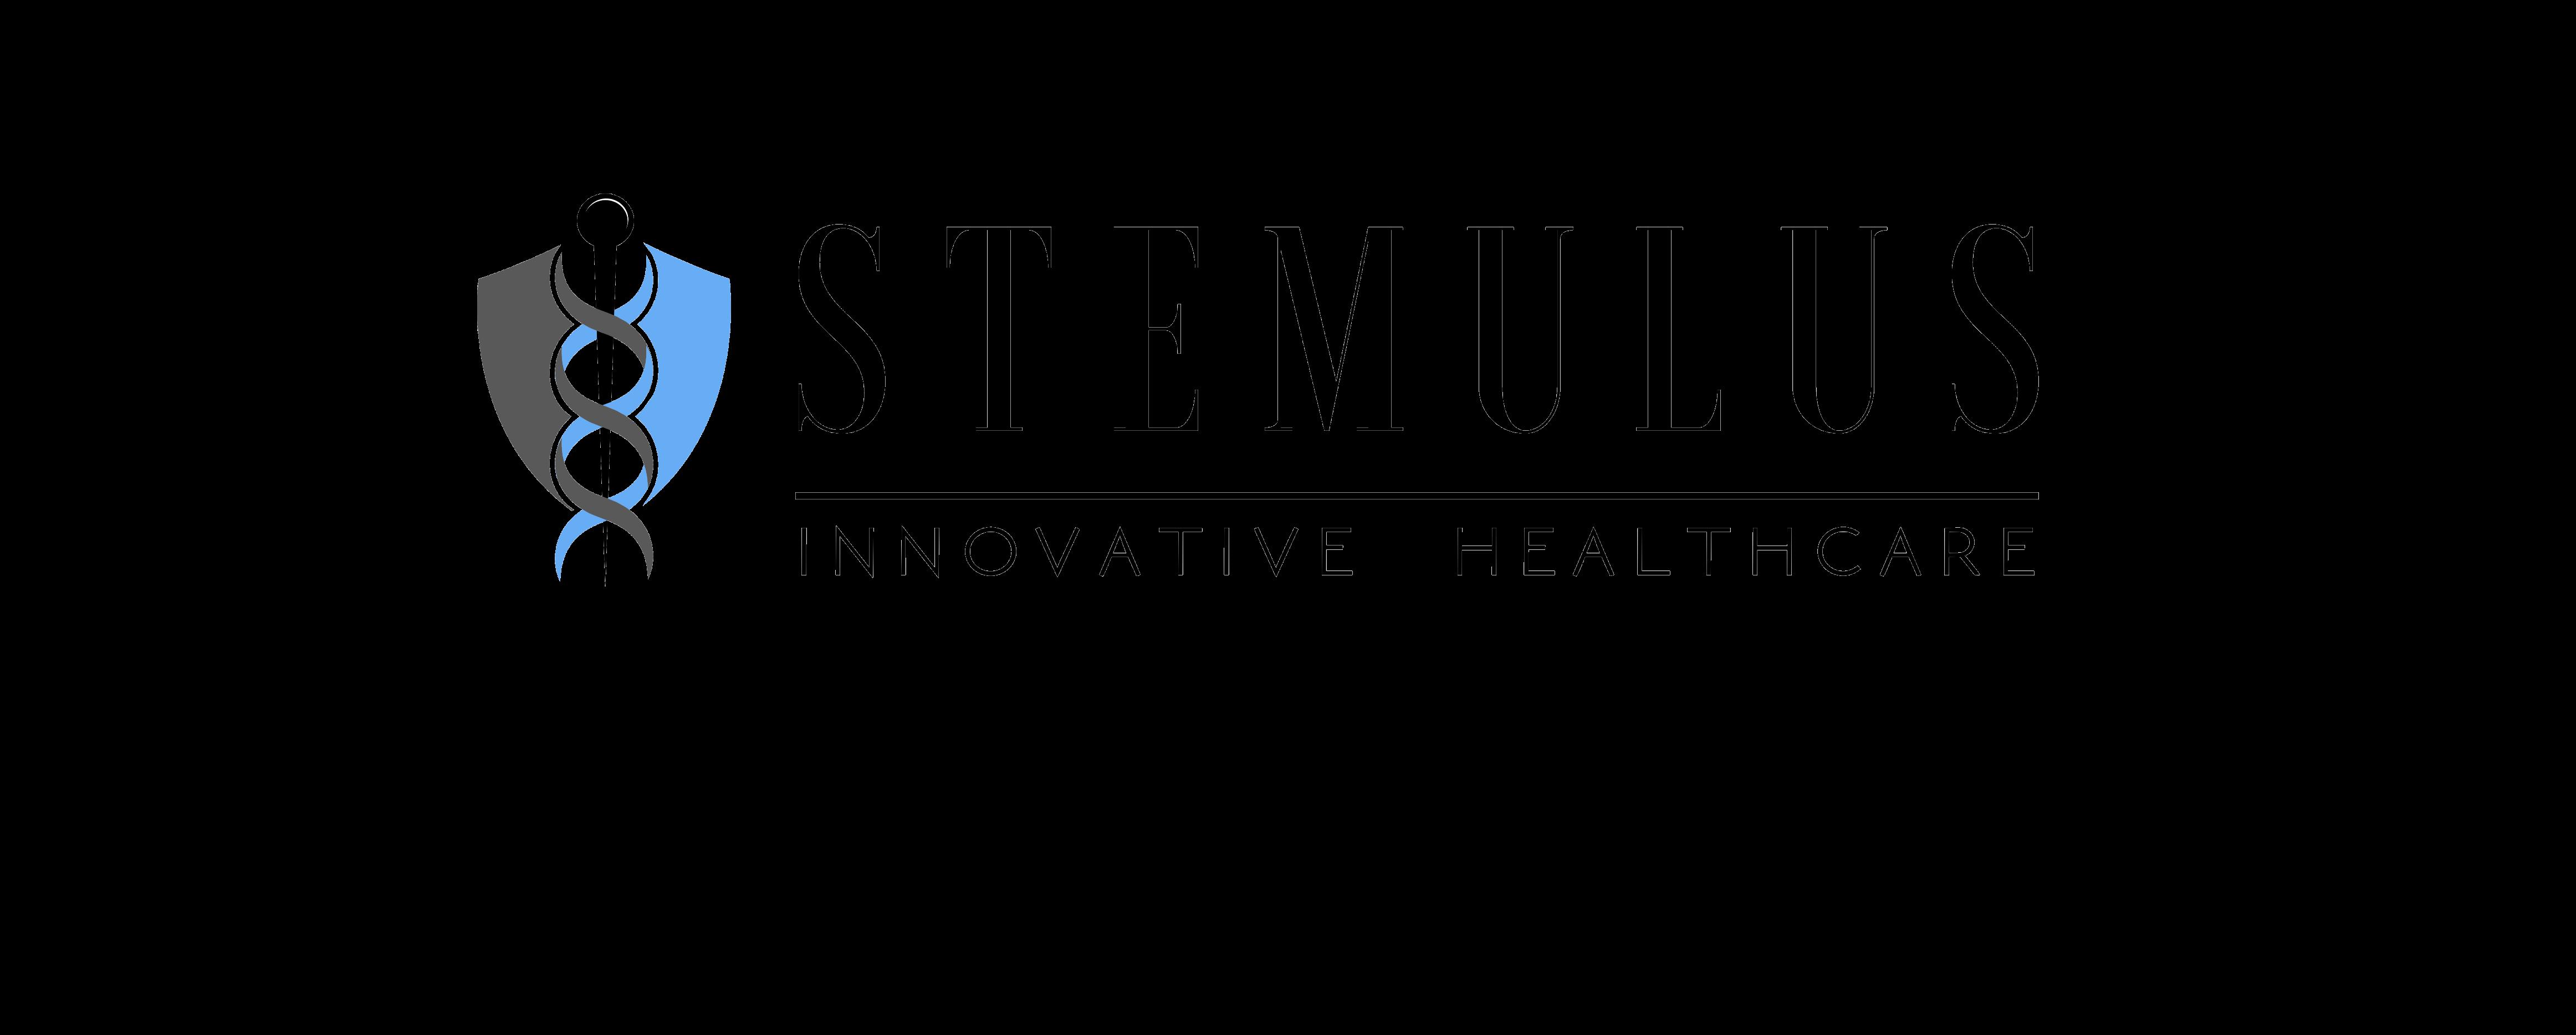 StemulusLogoHighResTRANSPARENT_WITH_TAGLINE